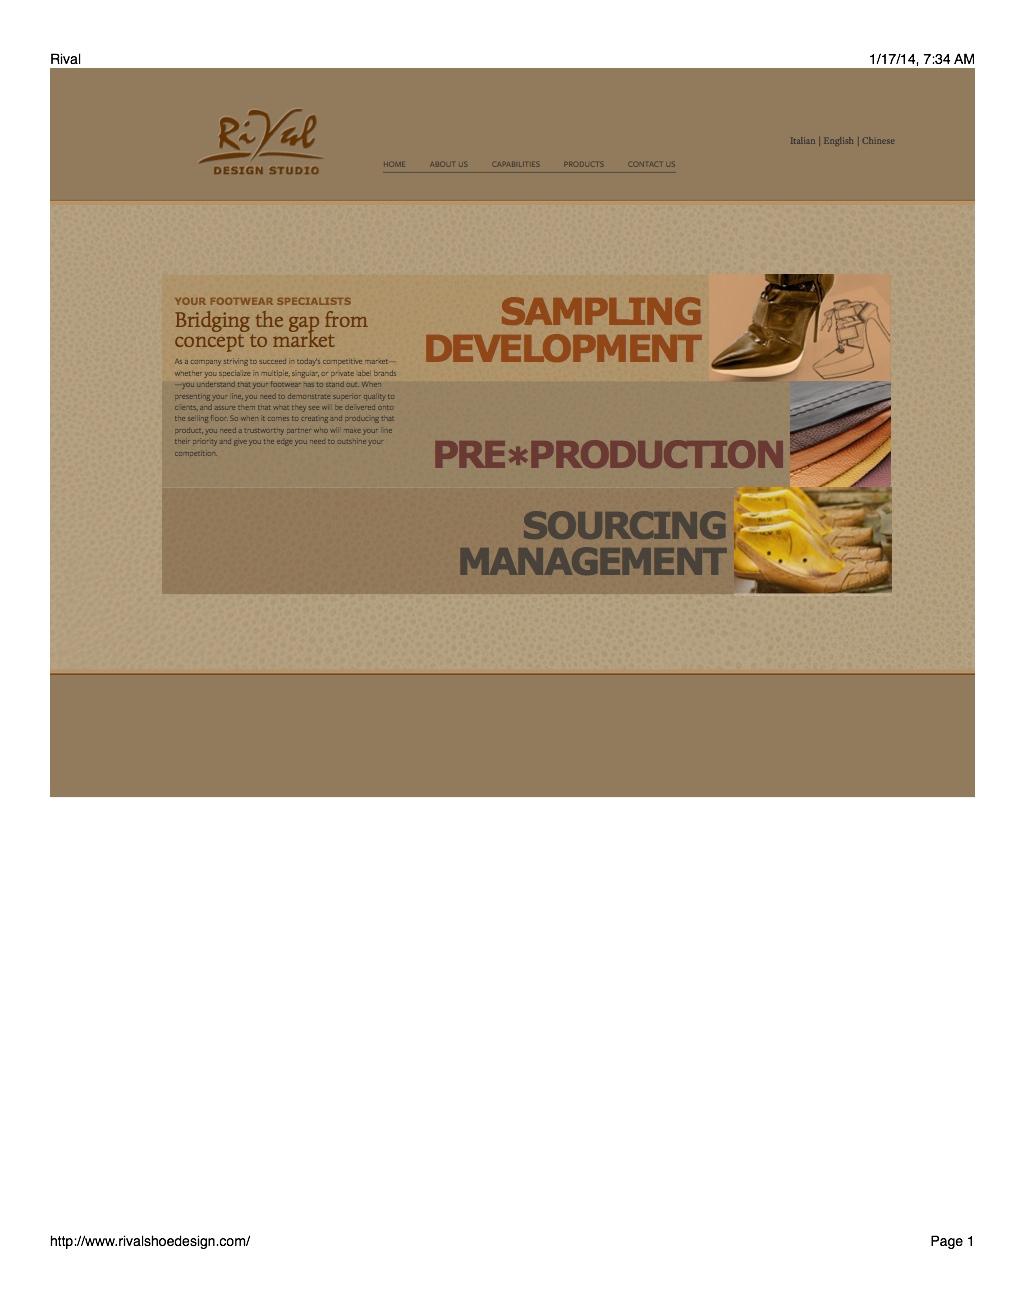 Web Content: Product Development